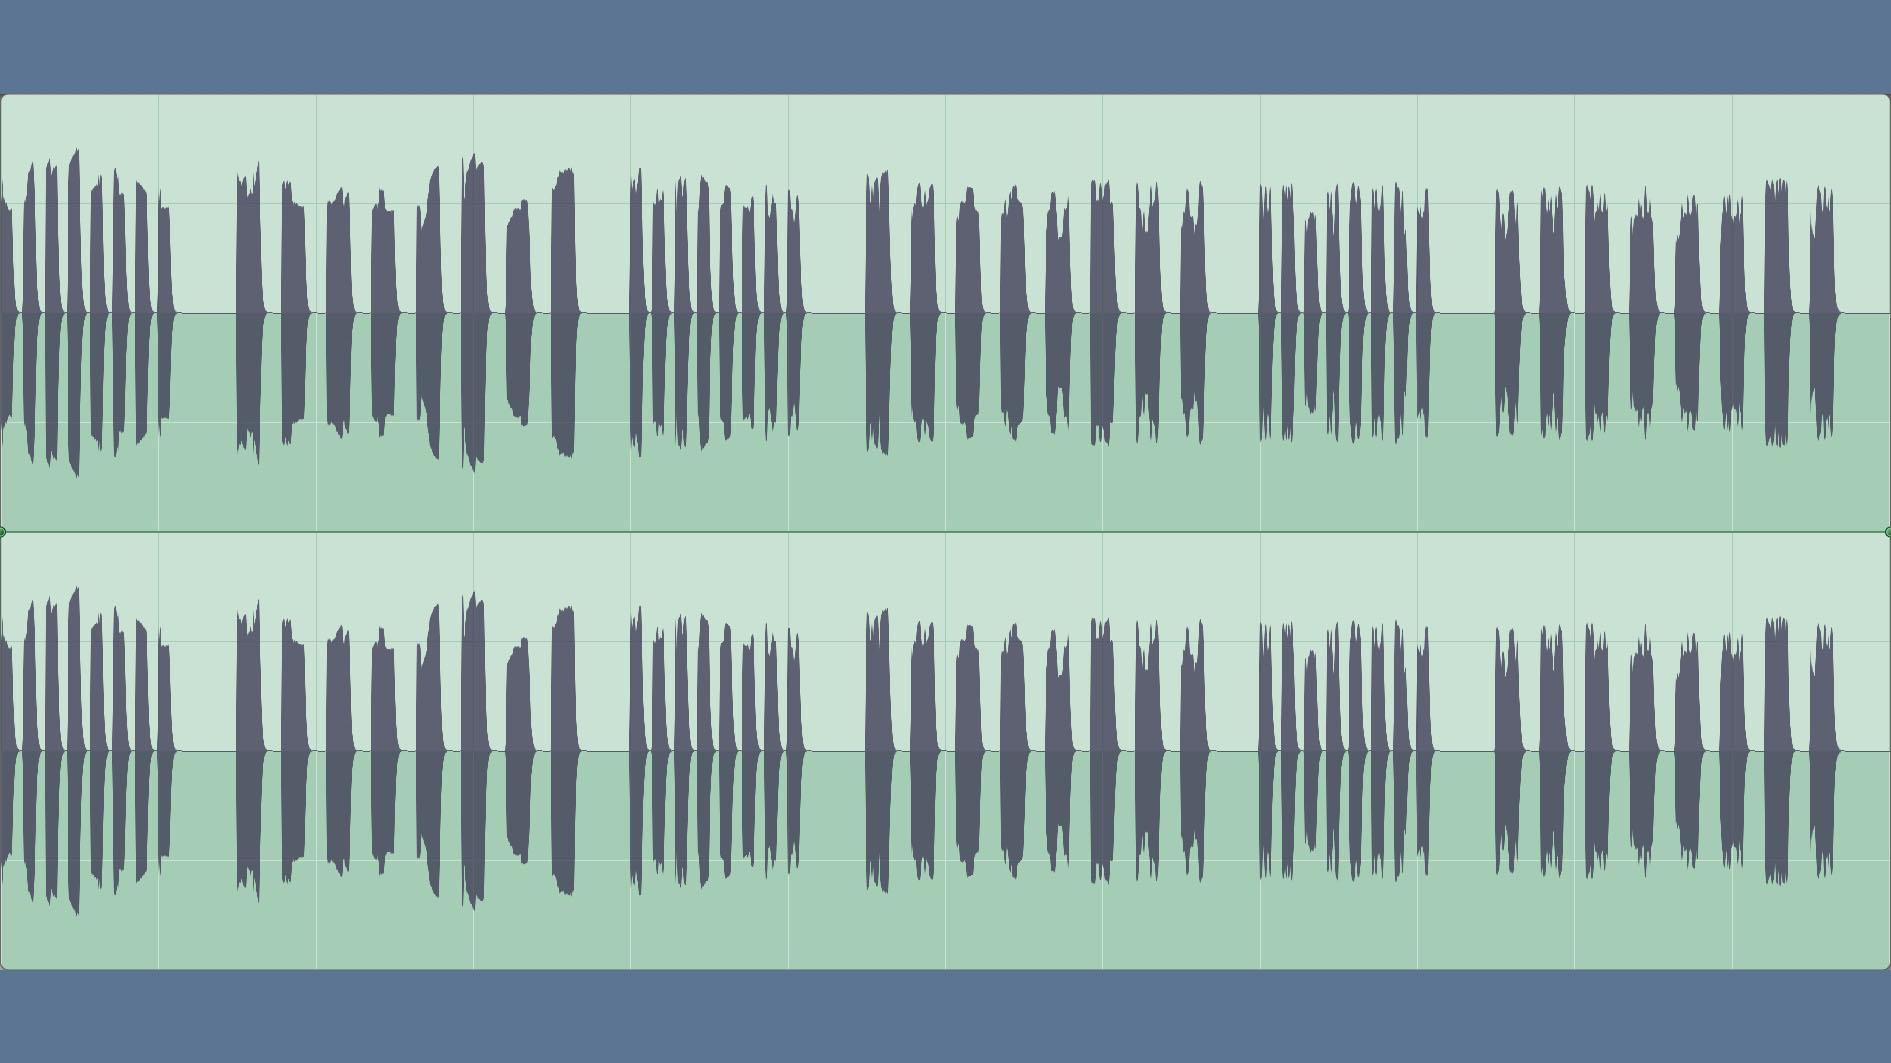 DRIFT example - IK Multimedia Syntronik - Vintage Synthesizer Plug-in